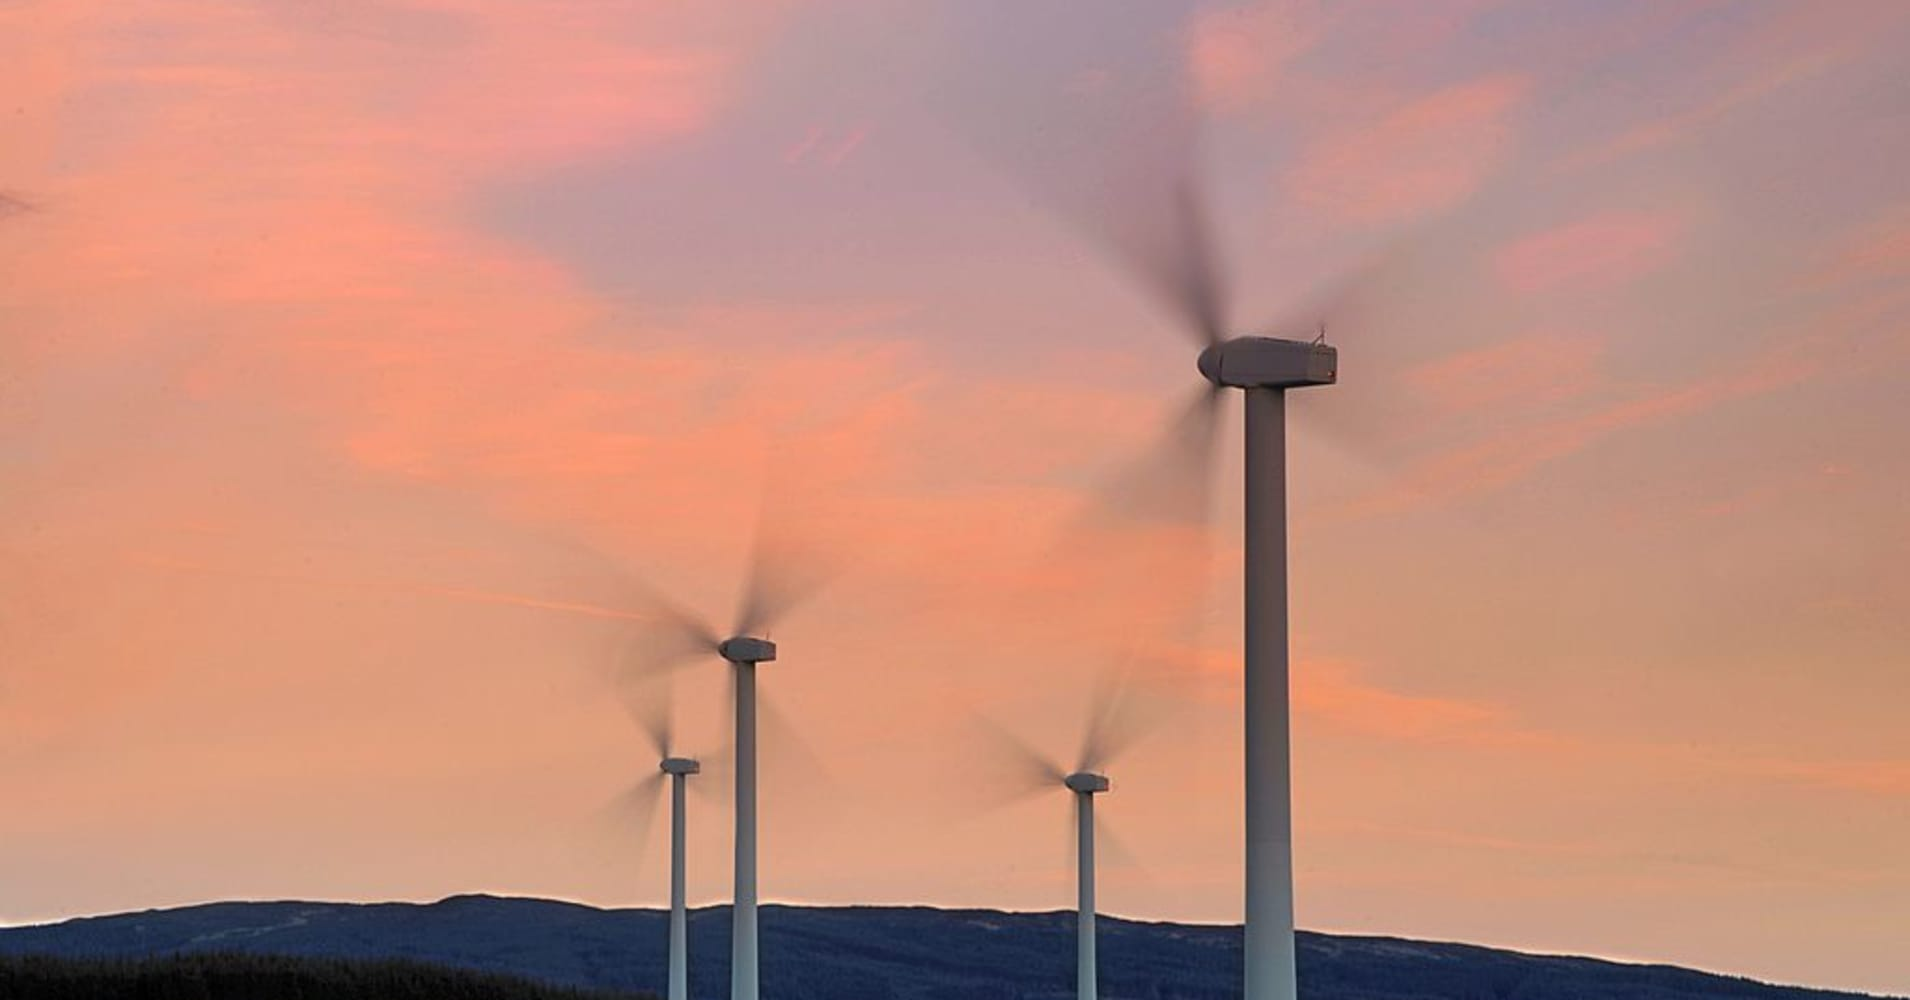 edf energy renewables purchases 11 wind farm sites in scotland. Black Bedroom Furniture Sets. Home Design Ideas